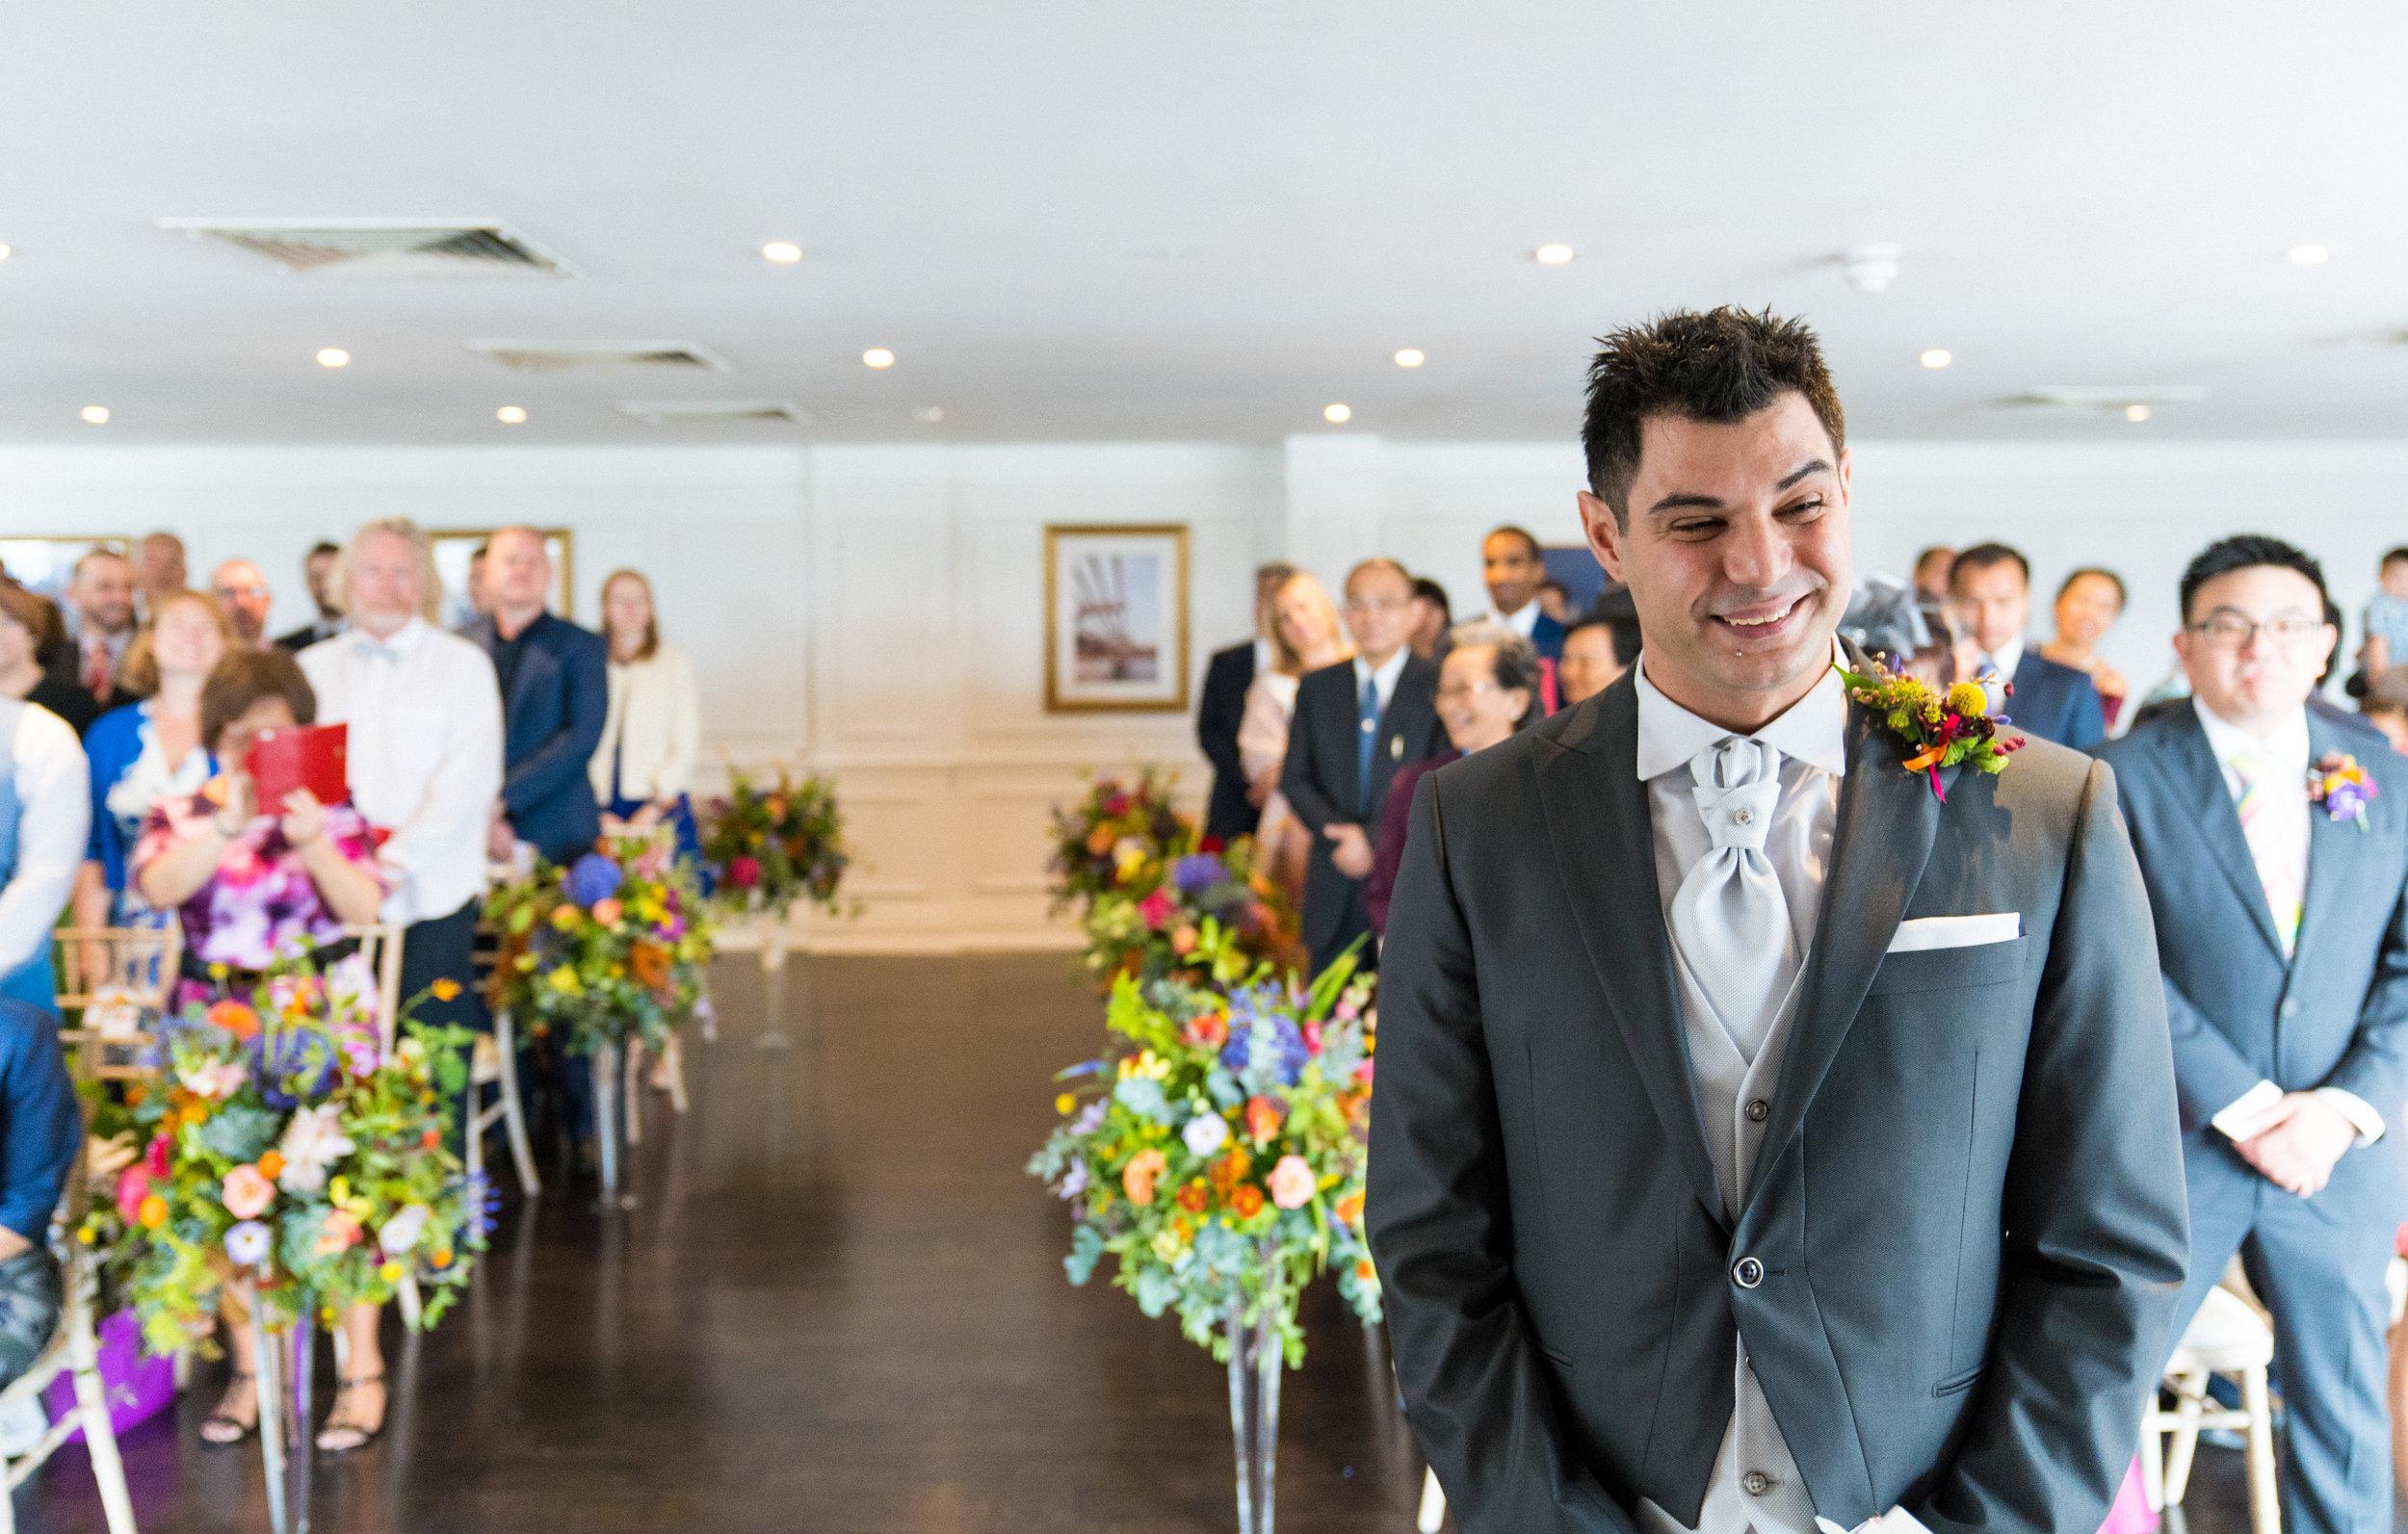 river-rooms-blackfriars-london-stpauls-mondrian-hotel-wedding-photography-videography-28